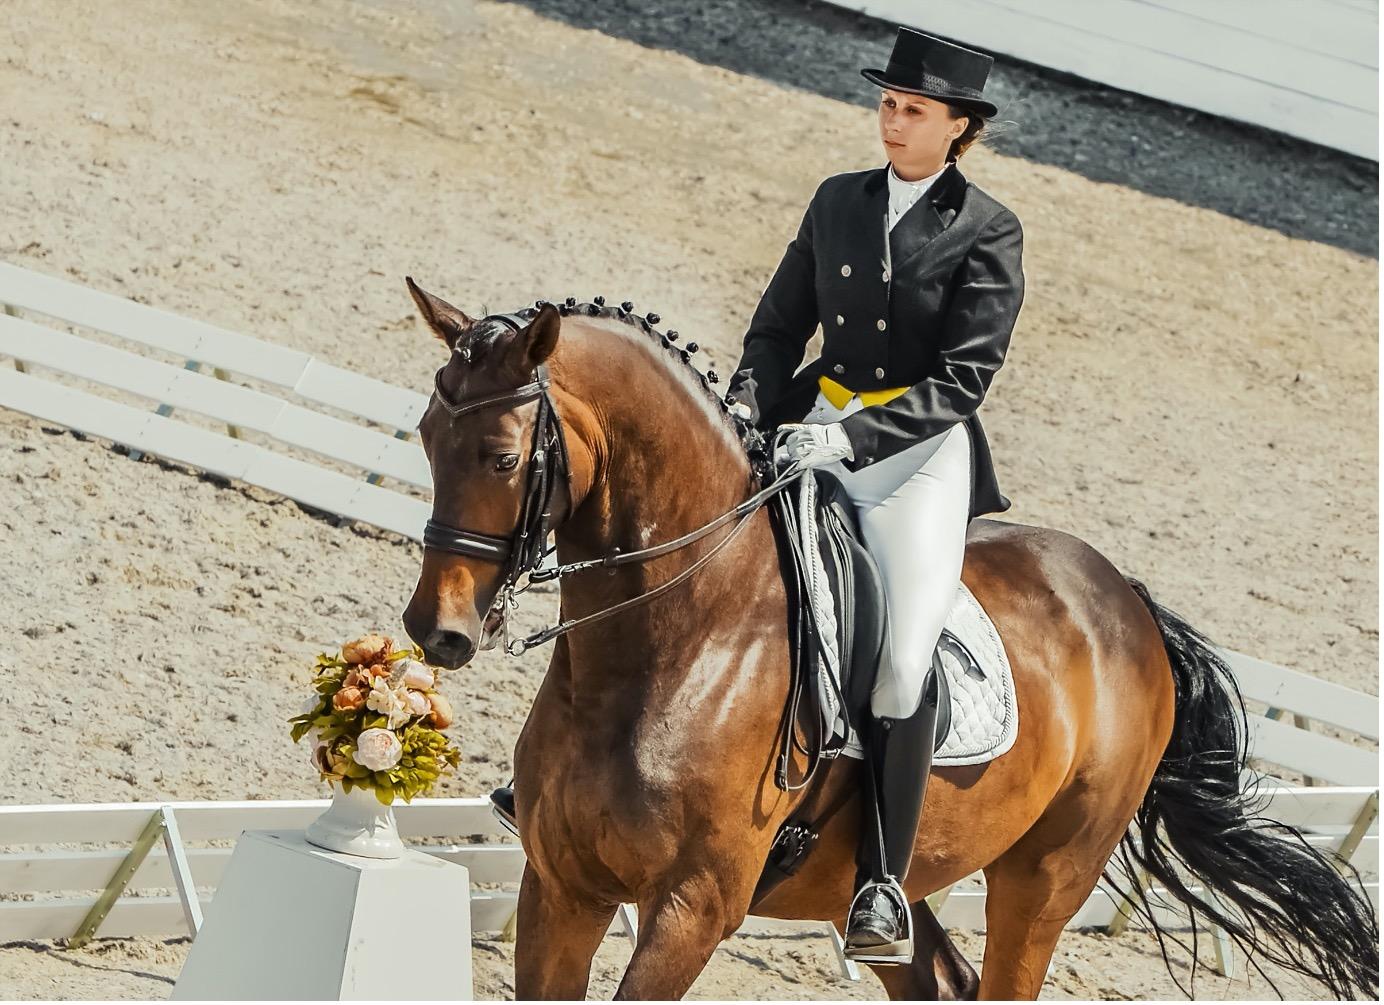 Knee Blocks In Dressage Saddles